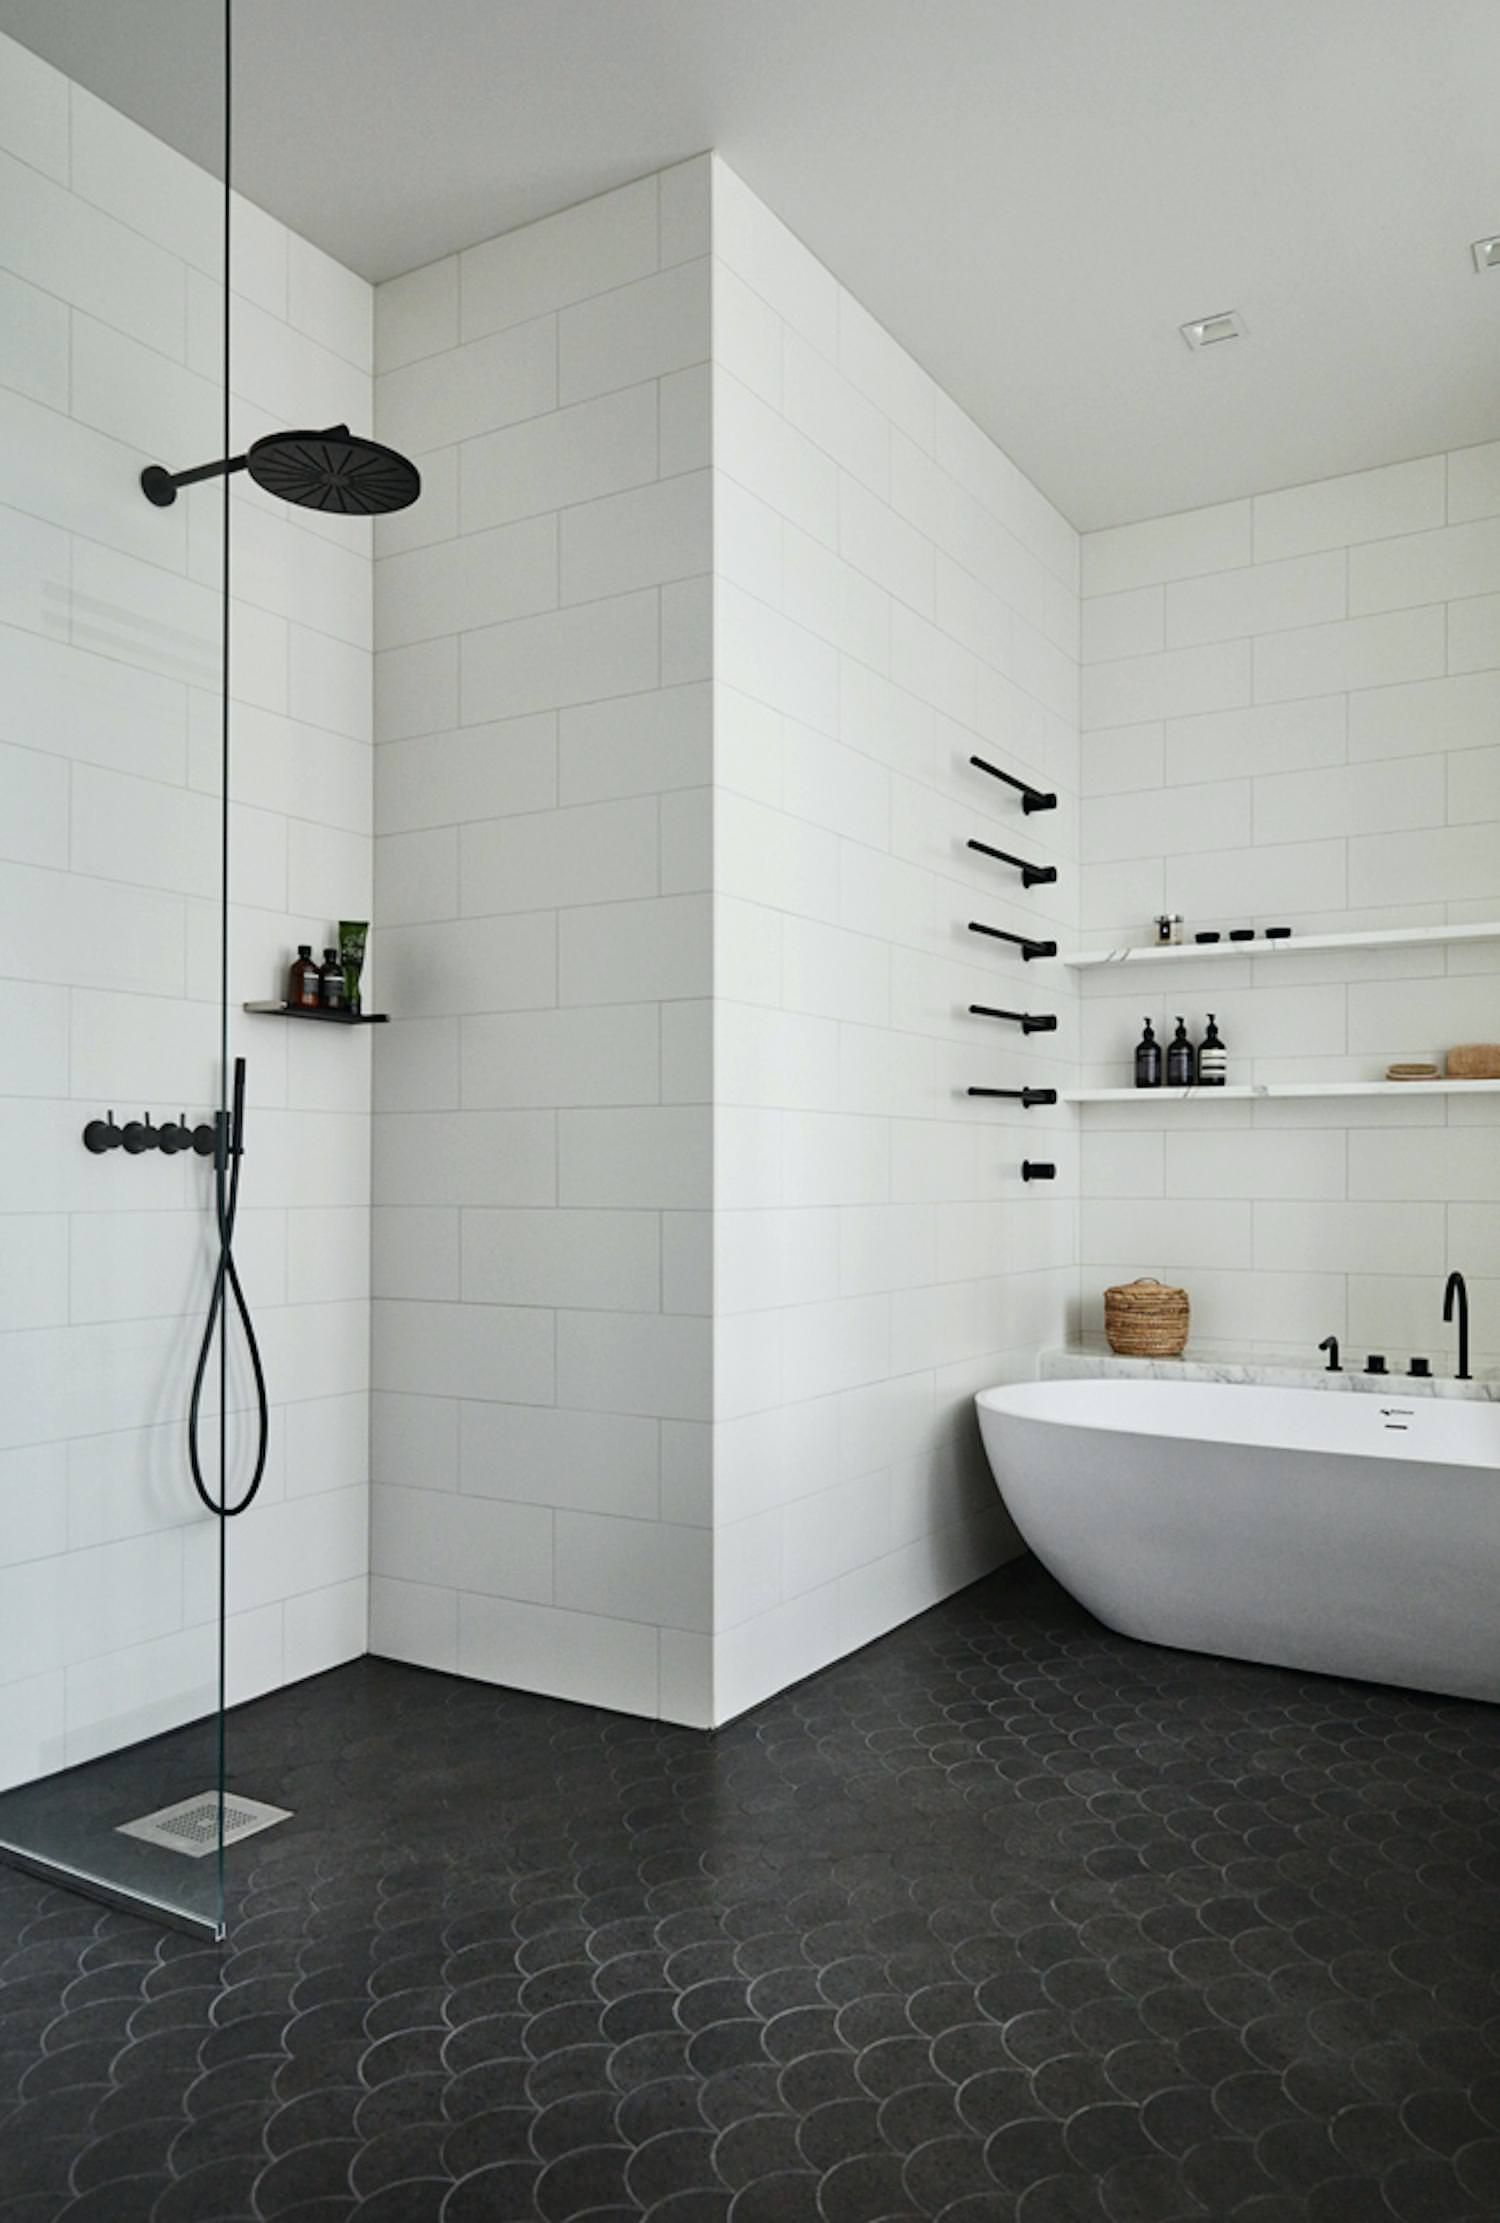 2018 Design Trends for the Bathroom   Home Inspiration ...